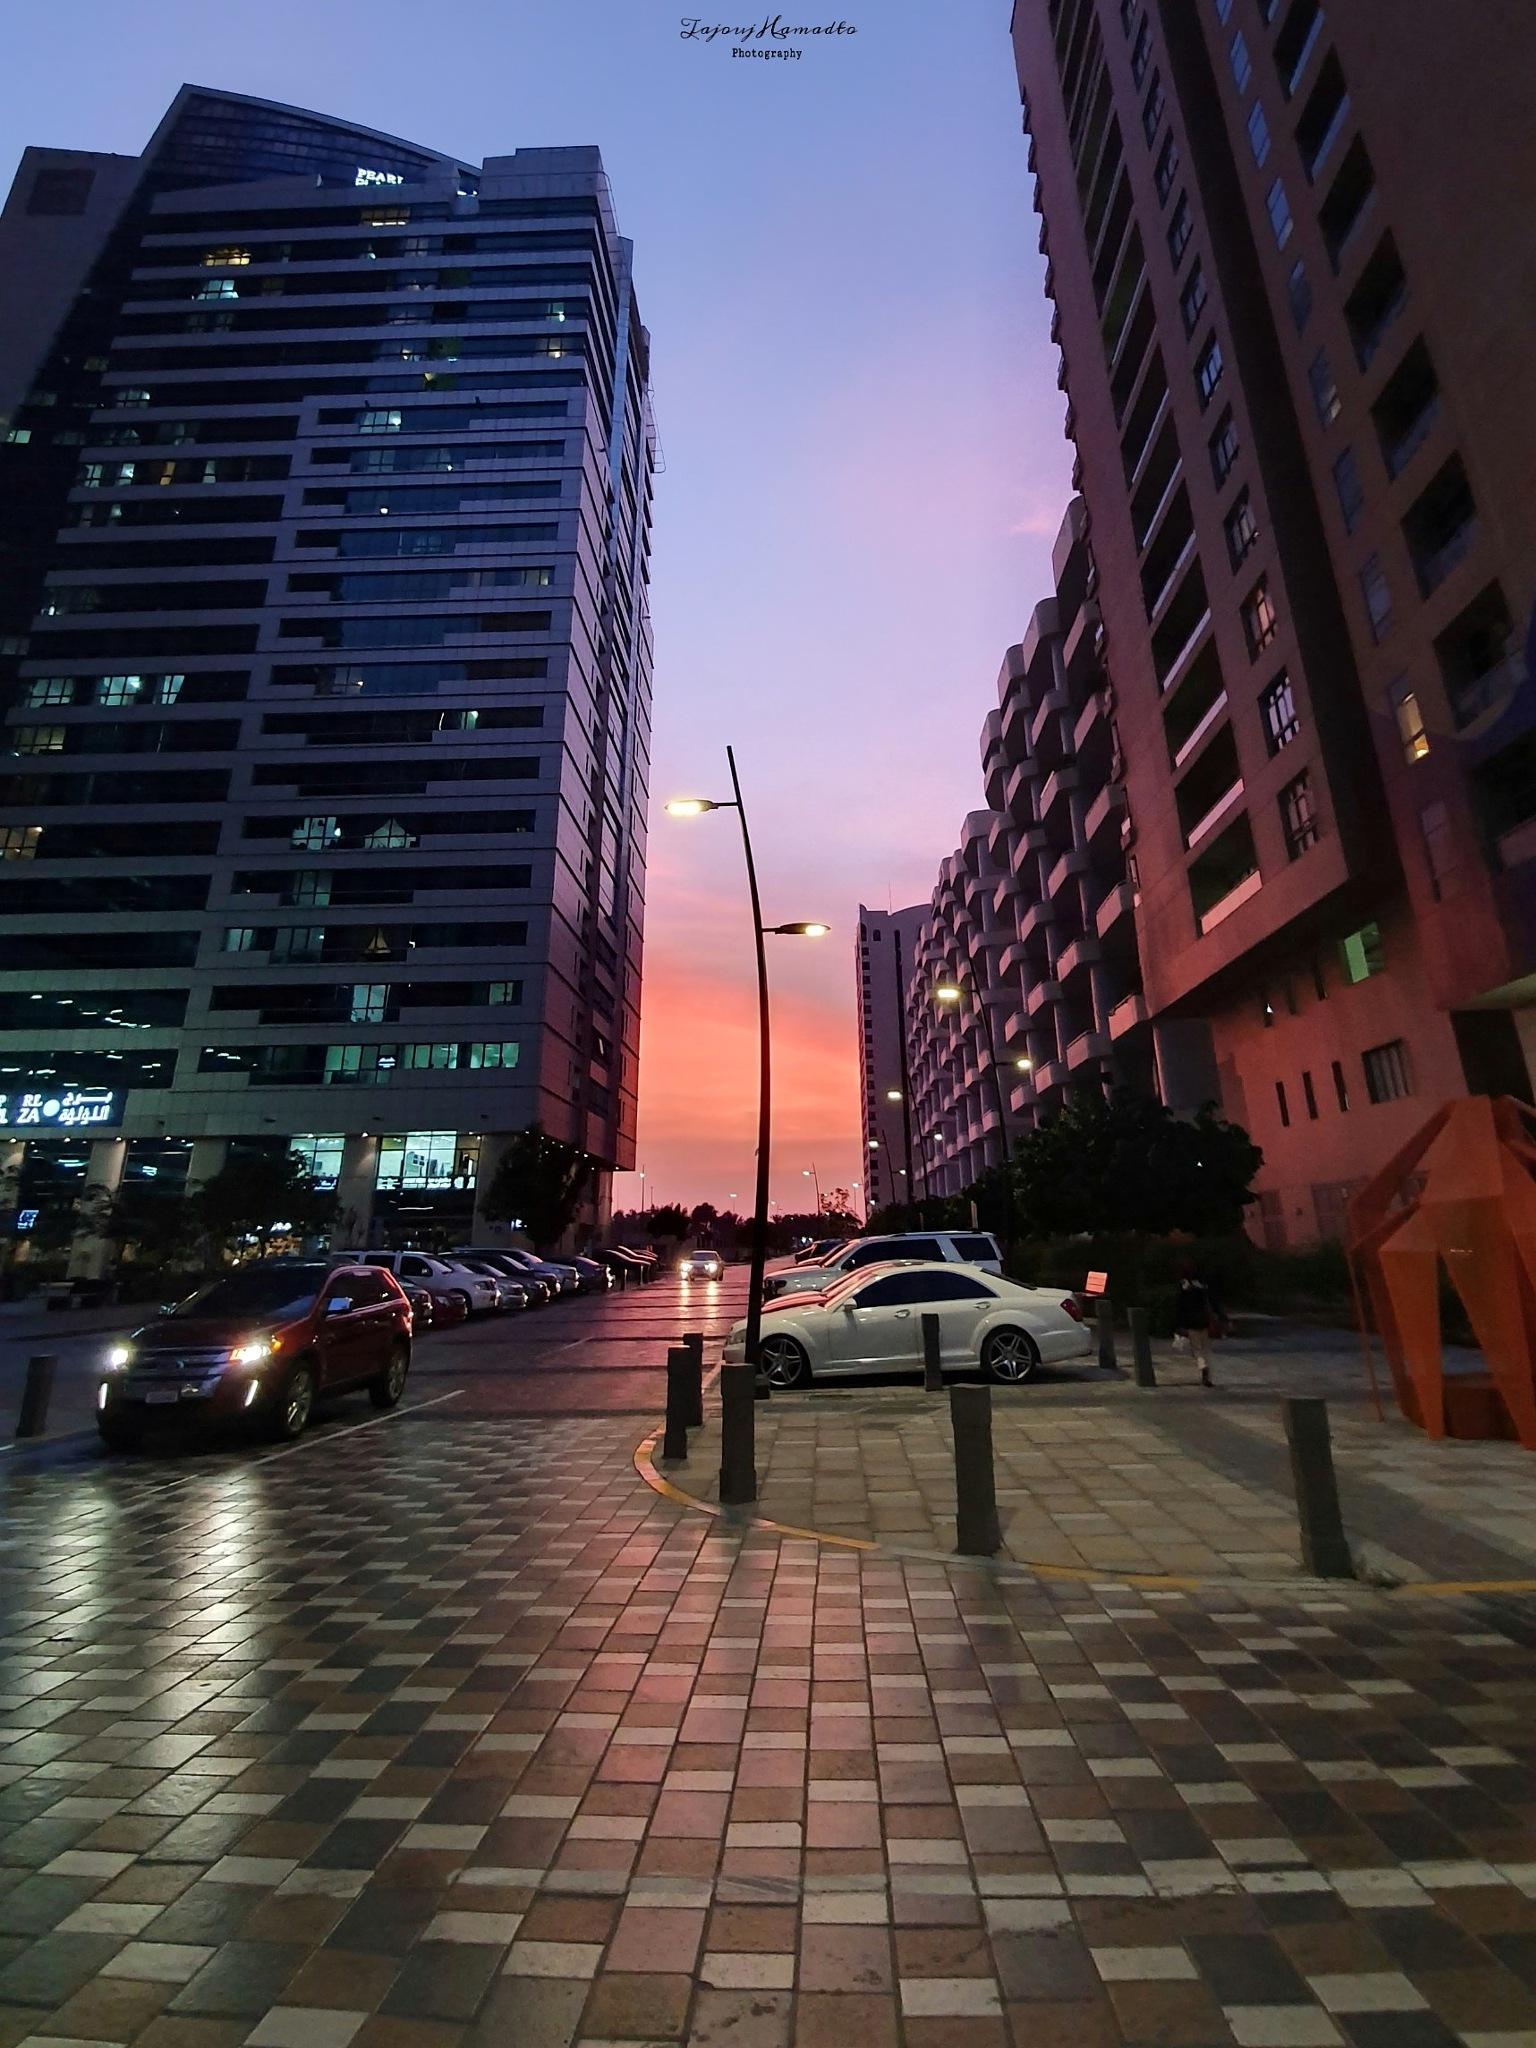 City Sunset  by Tajouj Hamadto